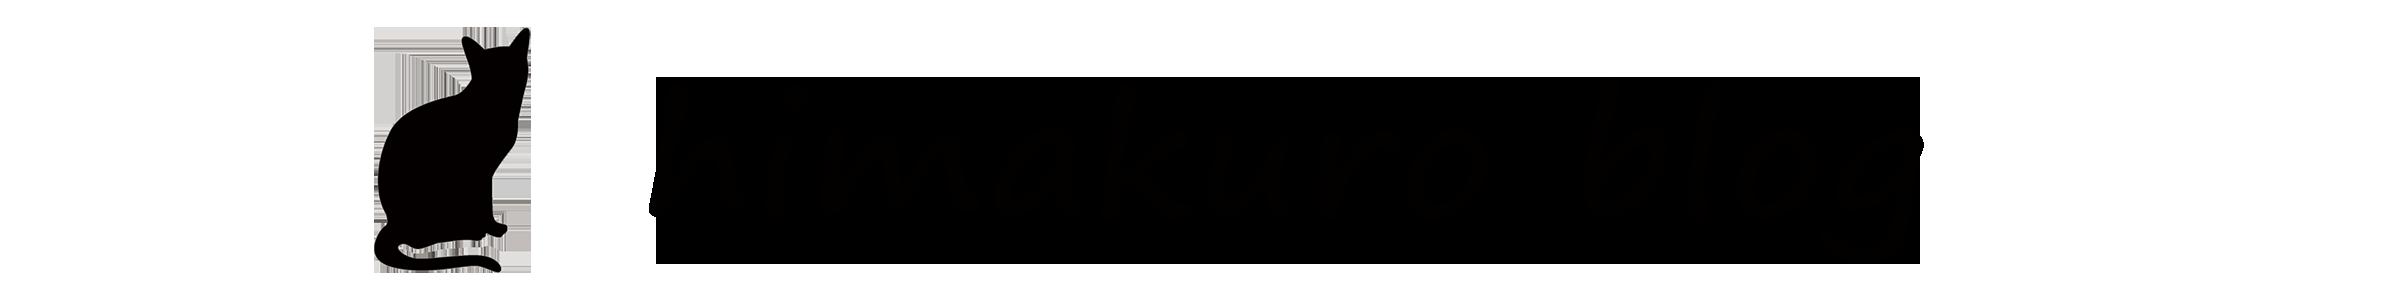 himakuroブログ